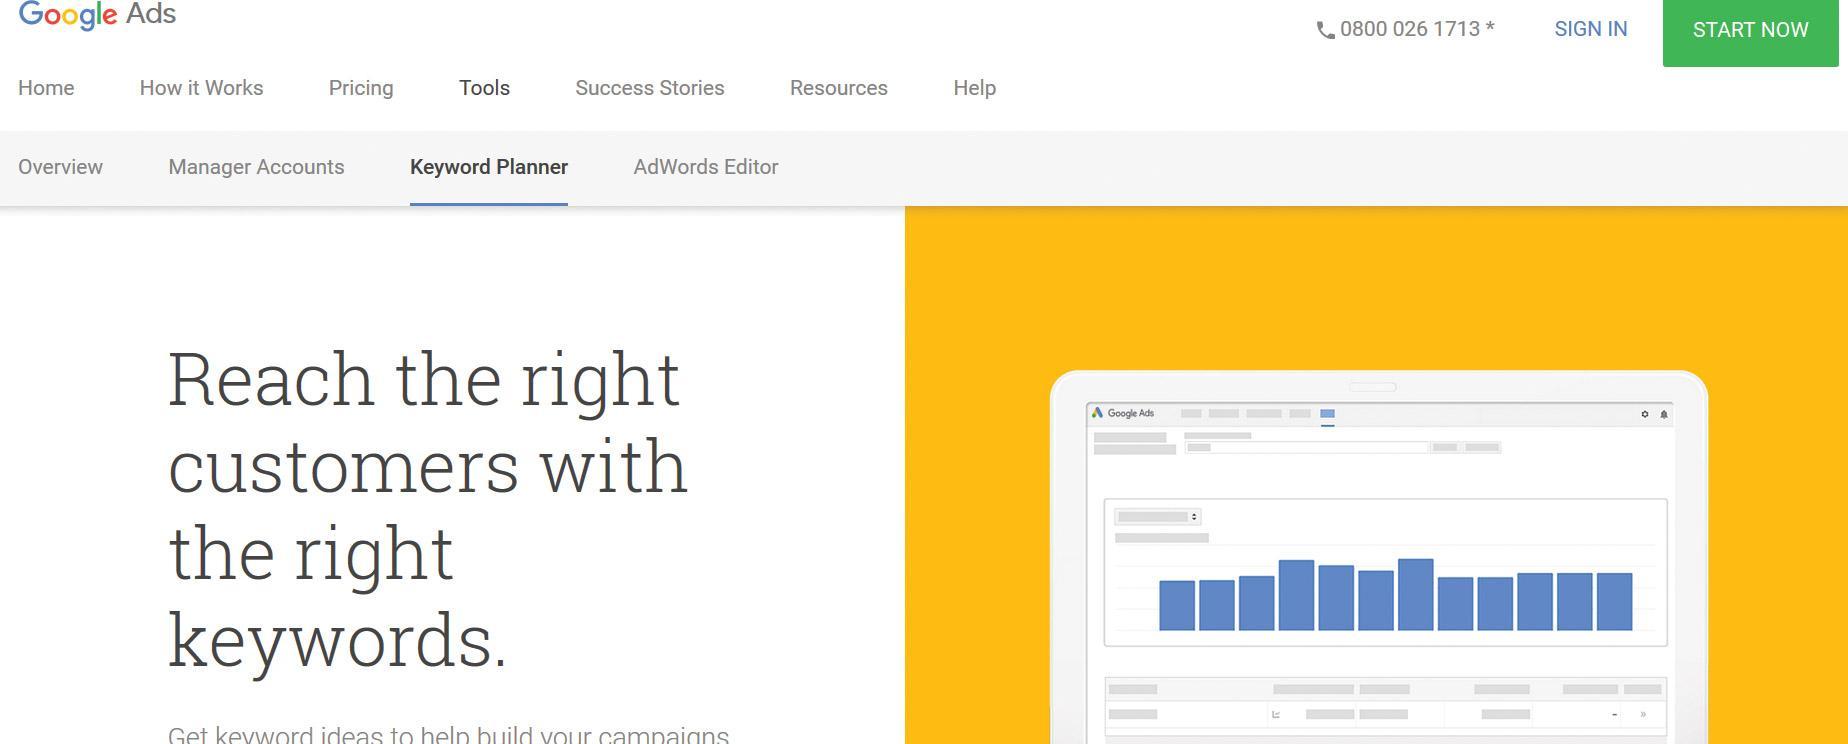 Google Keyword Tool screenshot